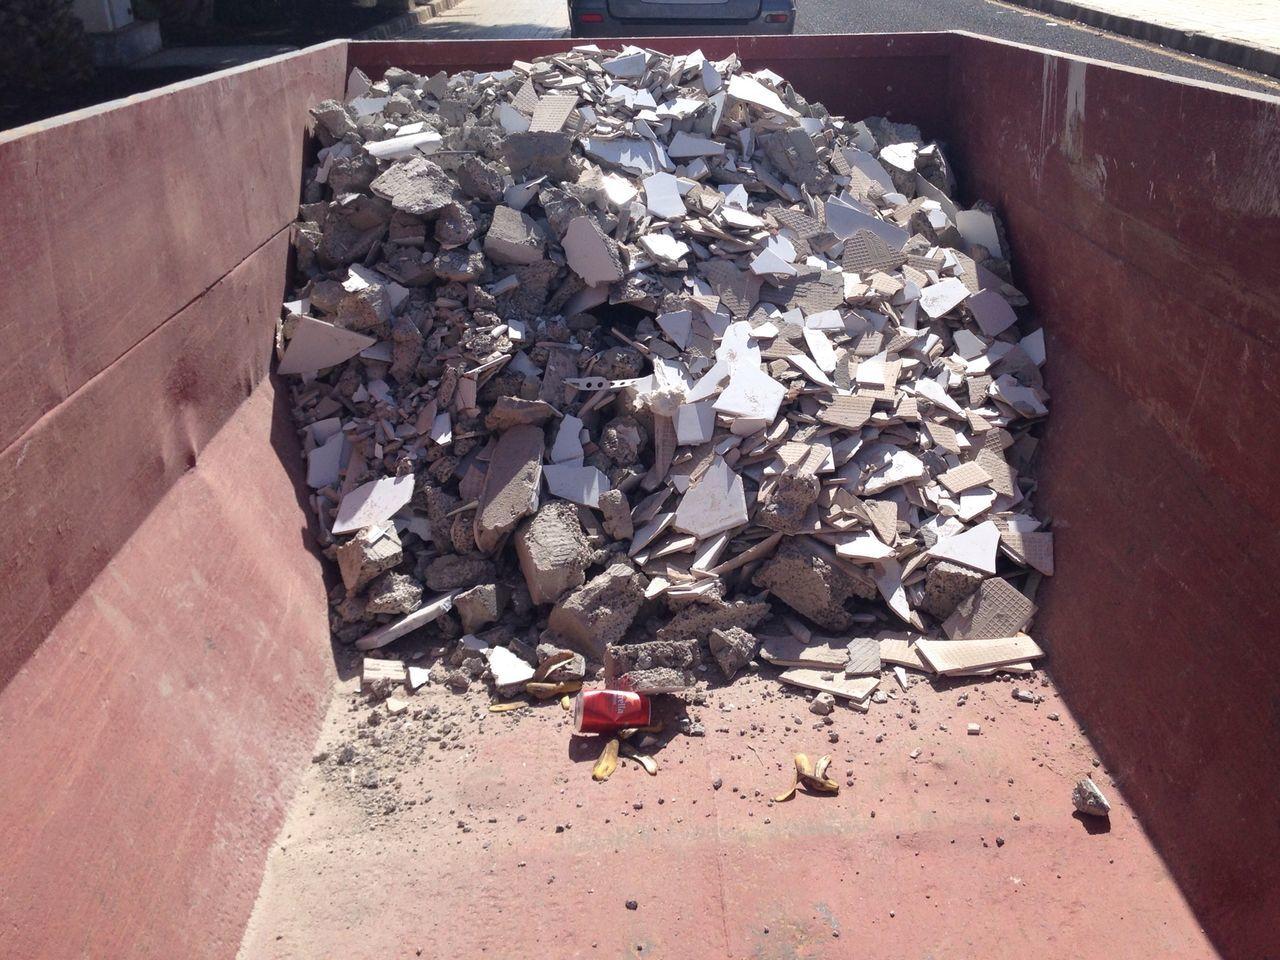 Entrümpeln Schutt Day No People Outdoors High Angle View Schuttcontainer Bauschutt entsorgen Steine💫 Container Müll Straße